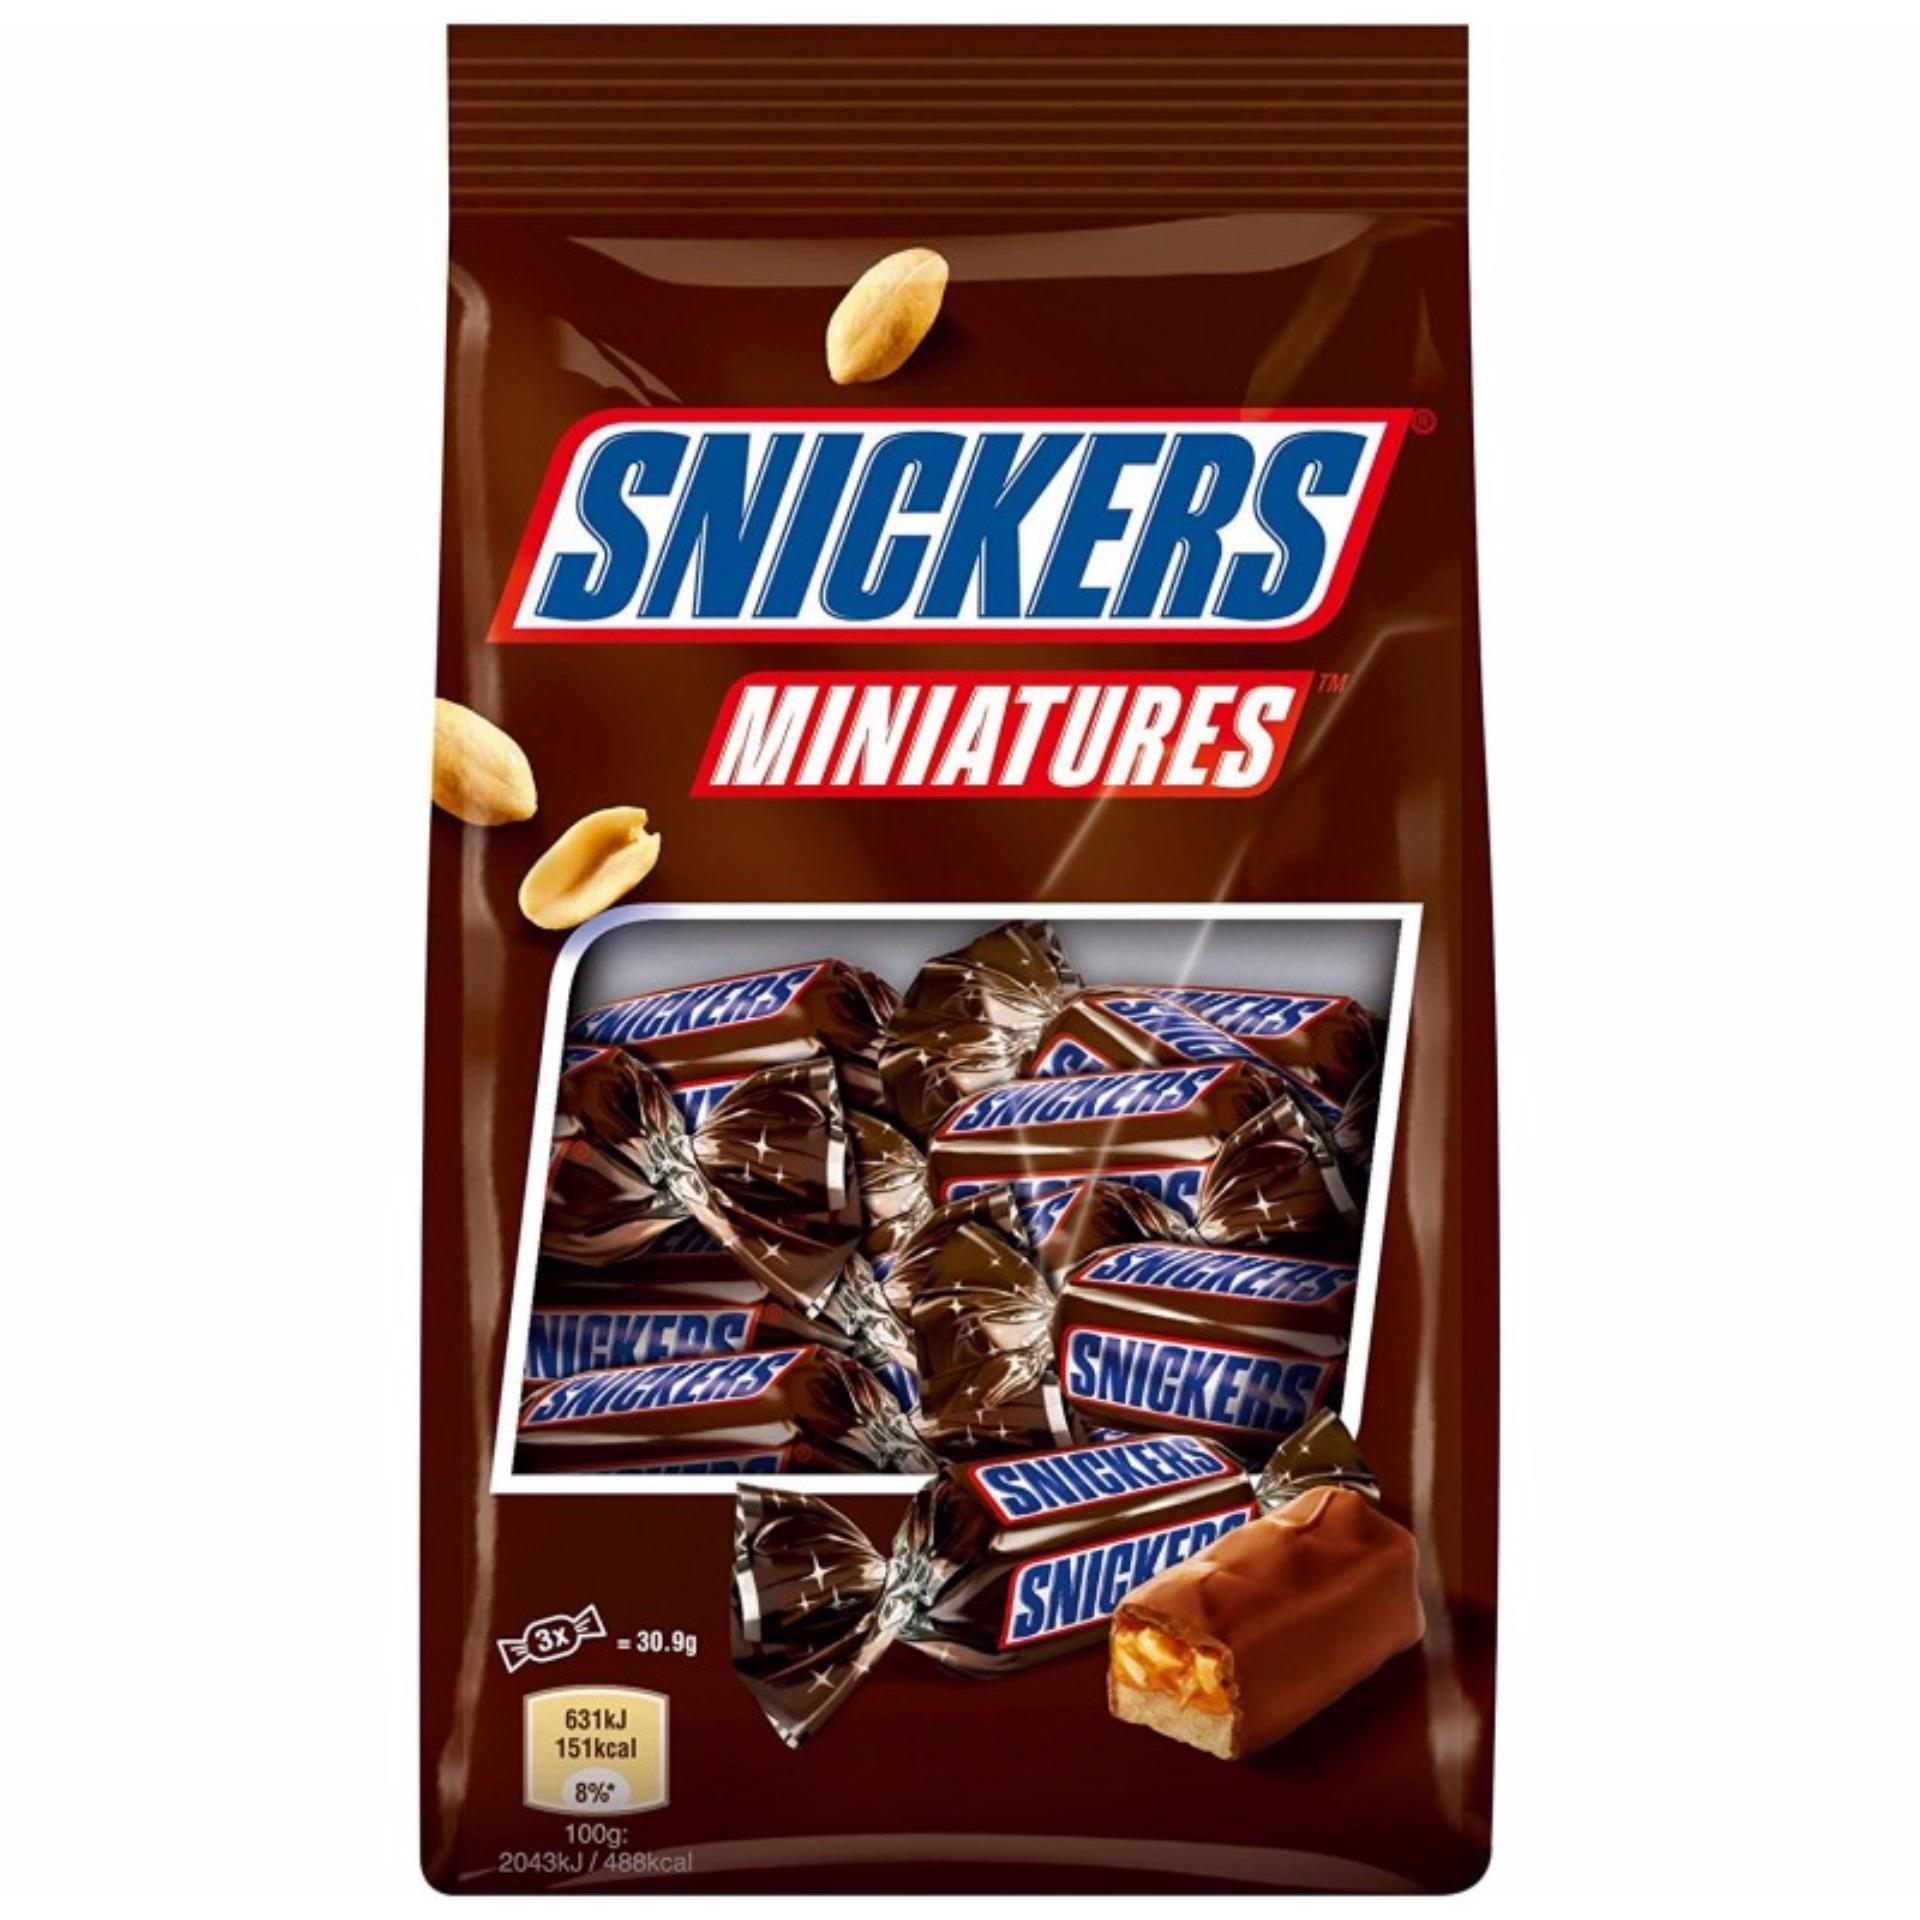 Cách mua Kẹo Socola Snickers Miniatures 150g